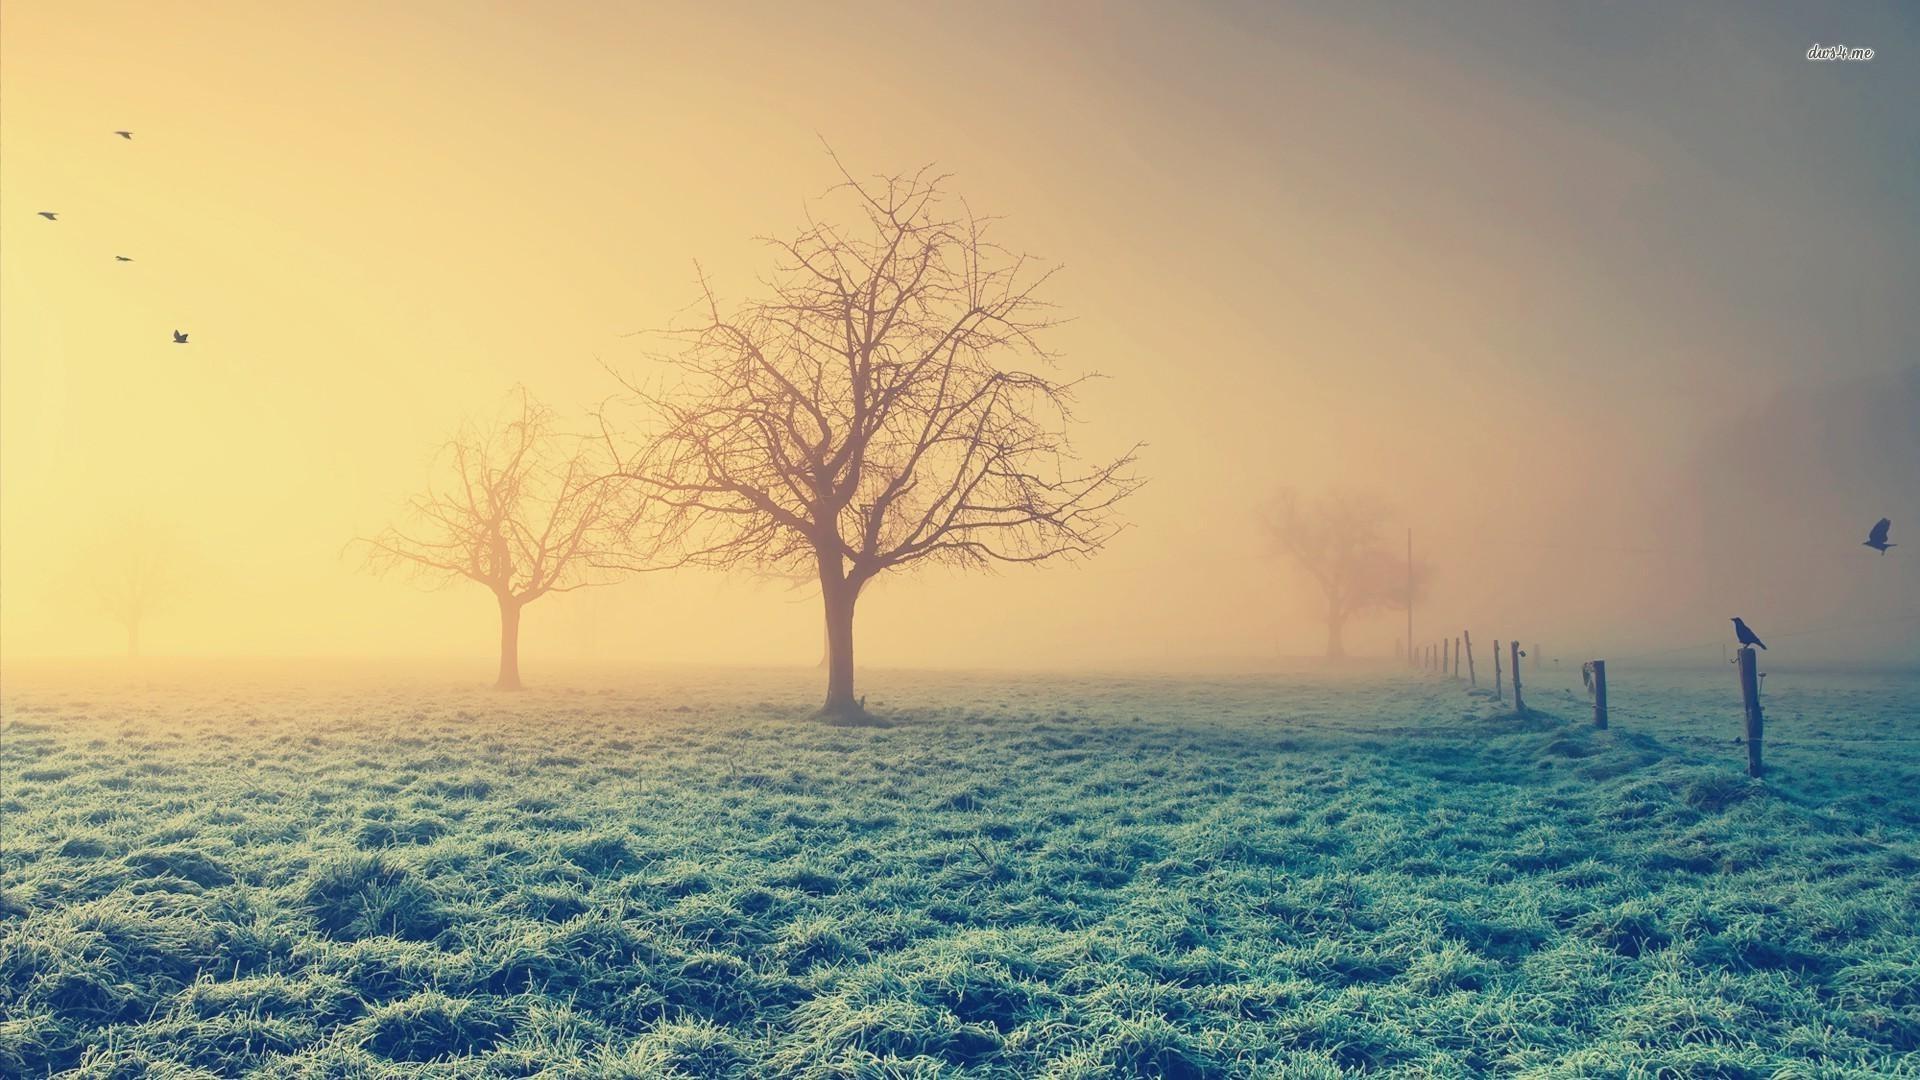 frosty morning wallpaper - photo #5